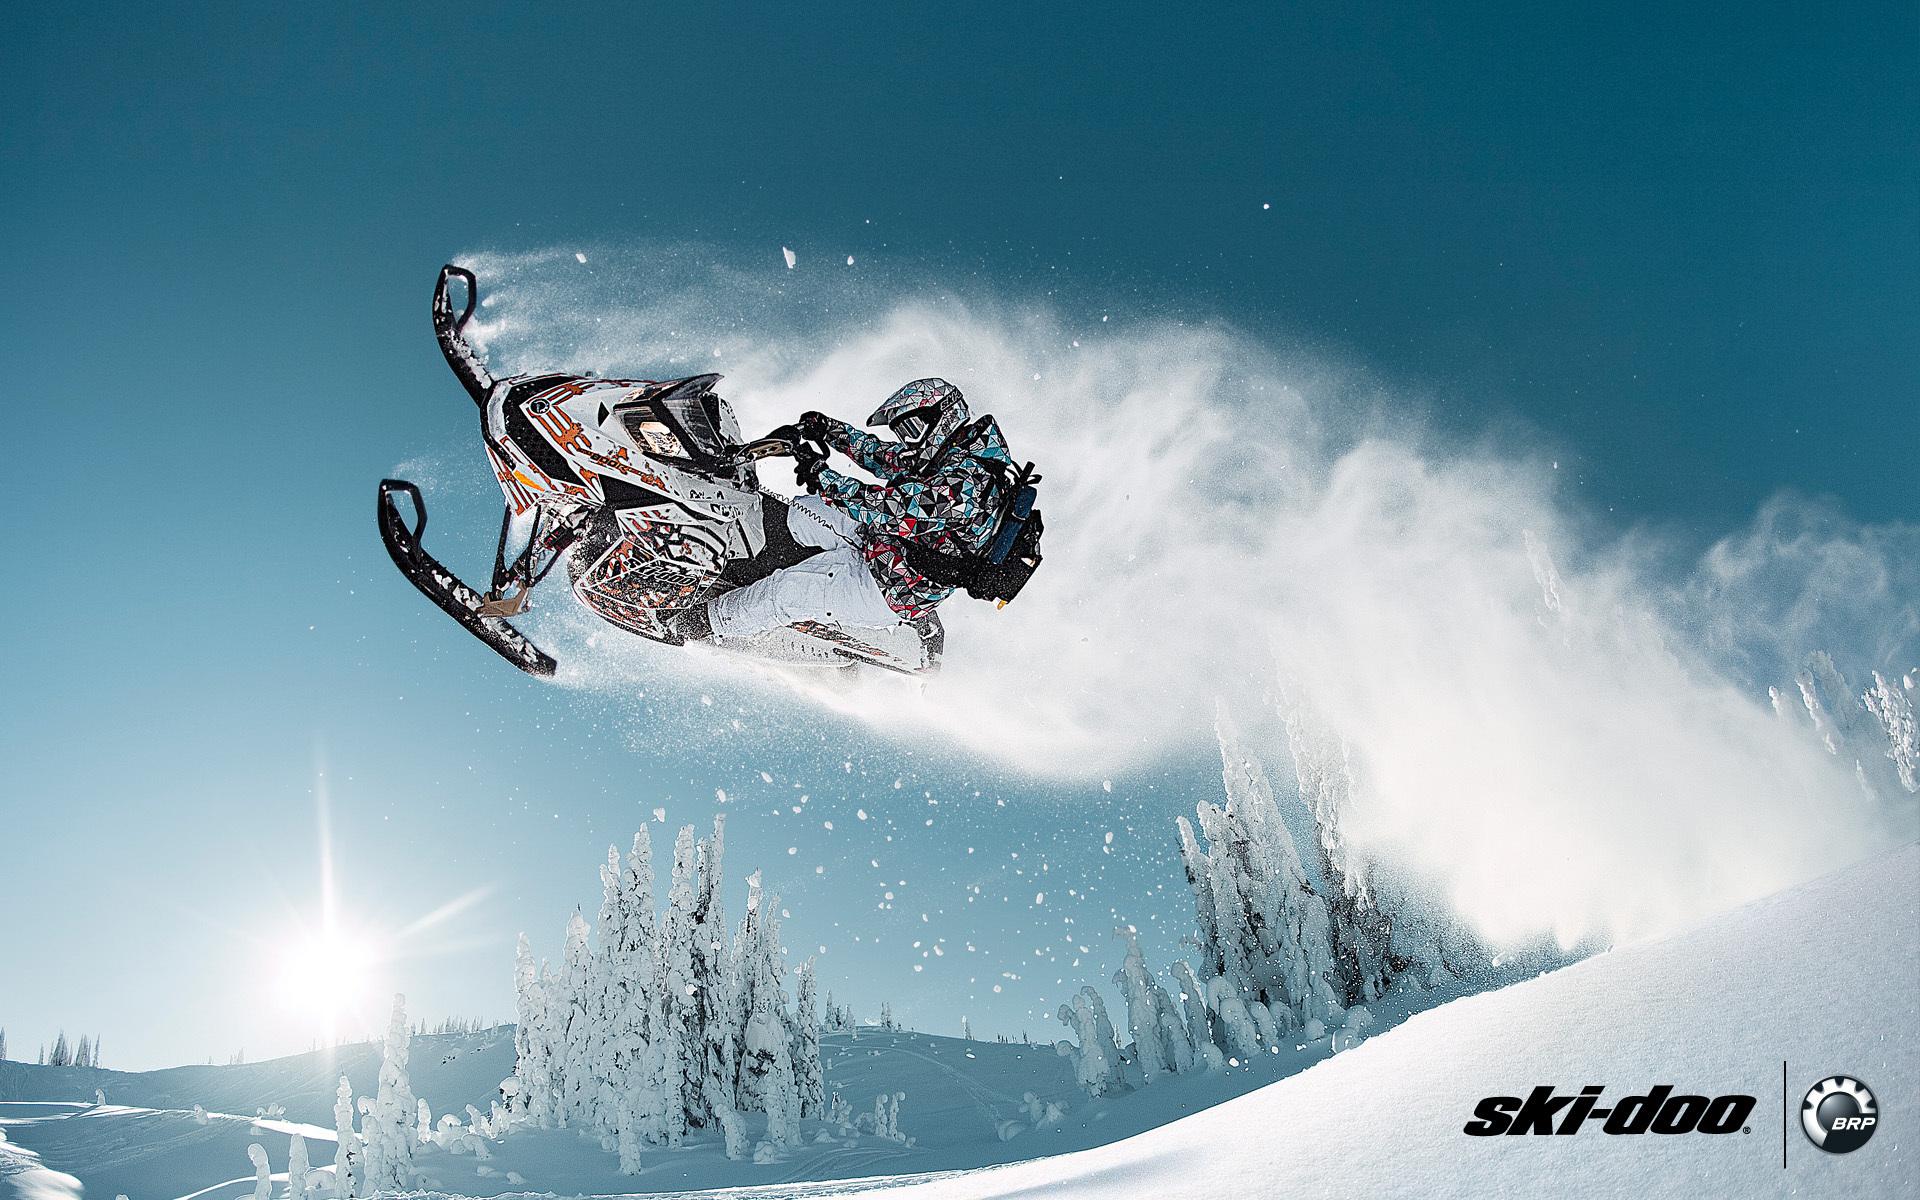 BRRP snowmobile ski doo ice mountain sport sunsire flight 1920x1200